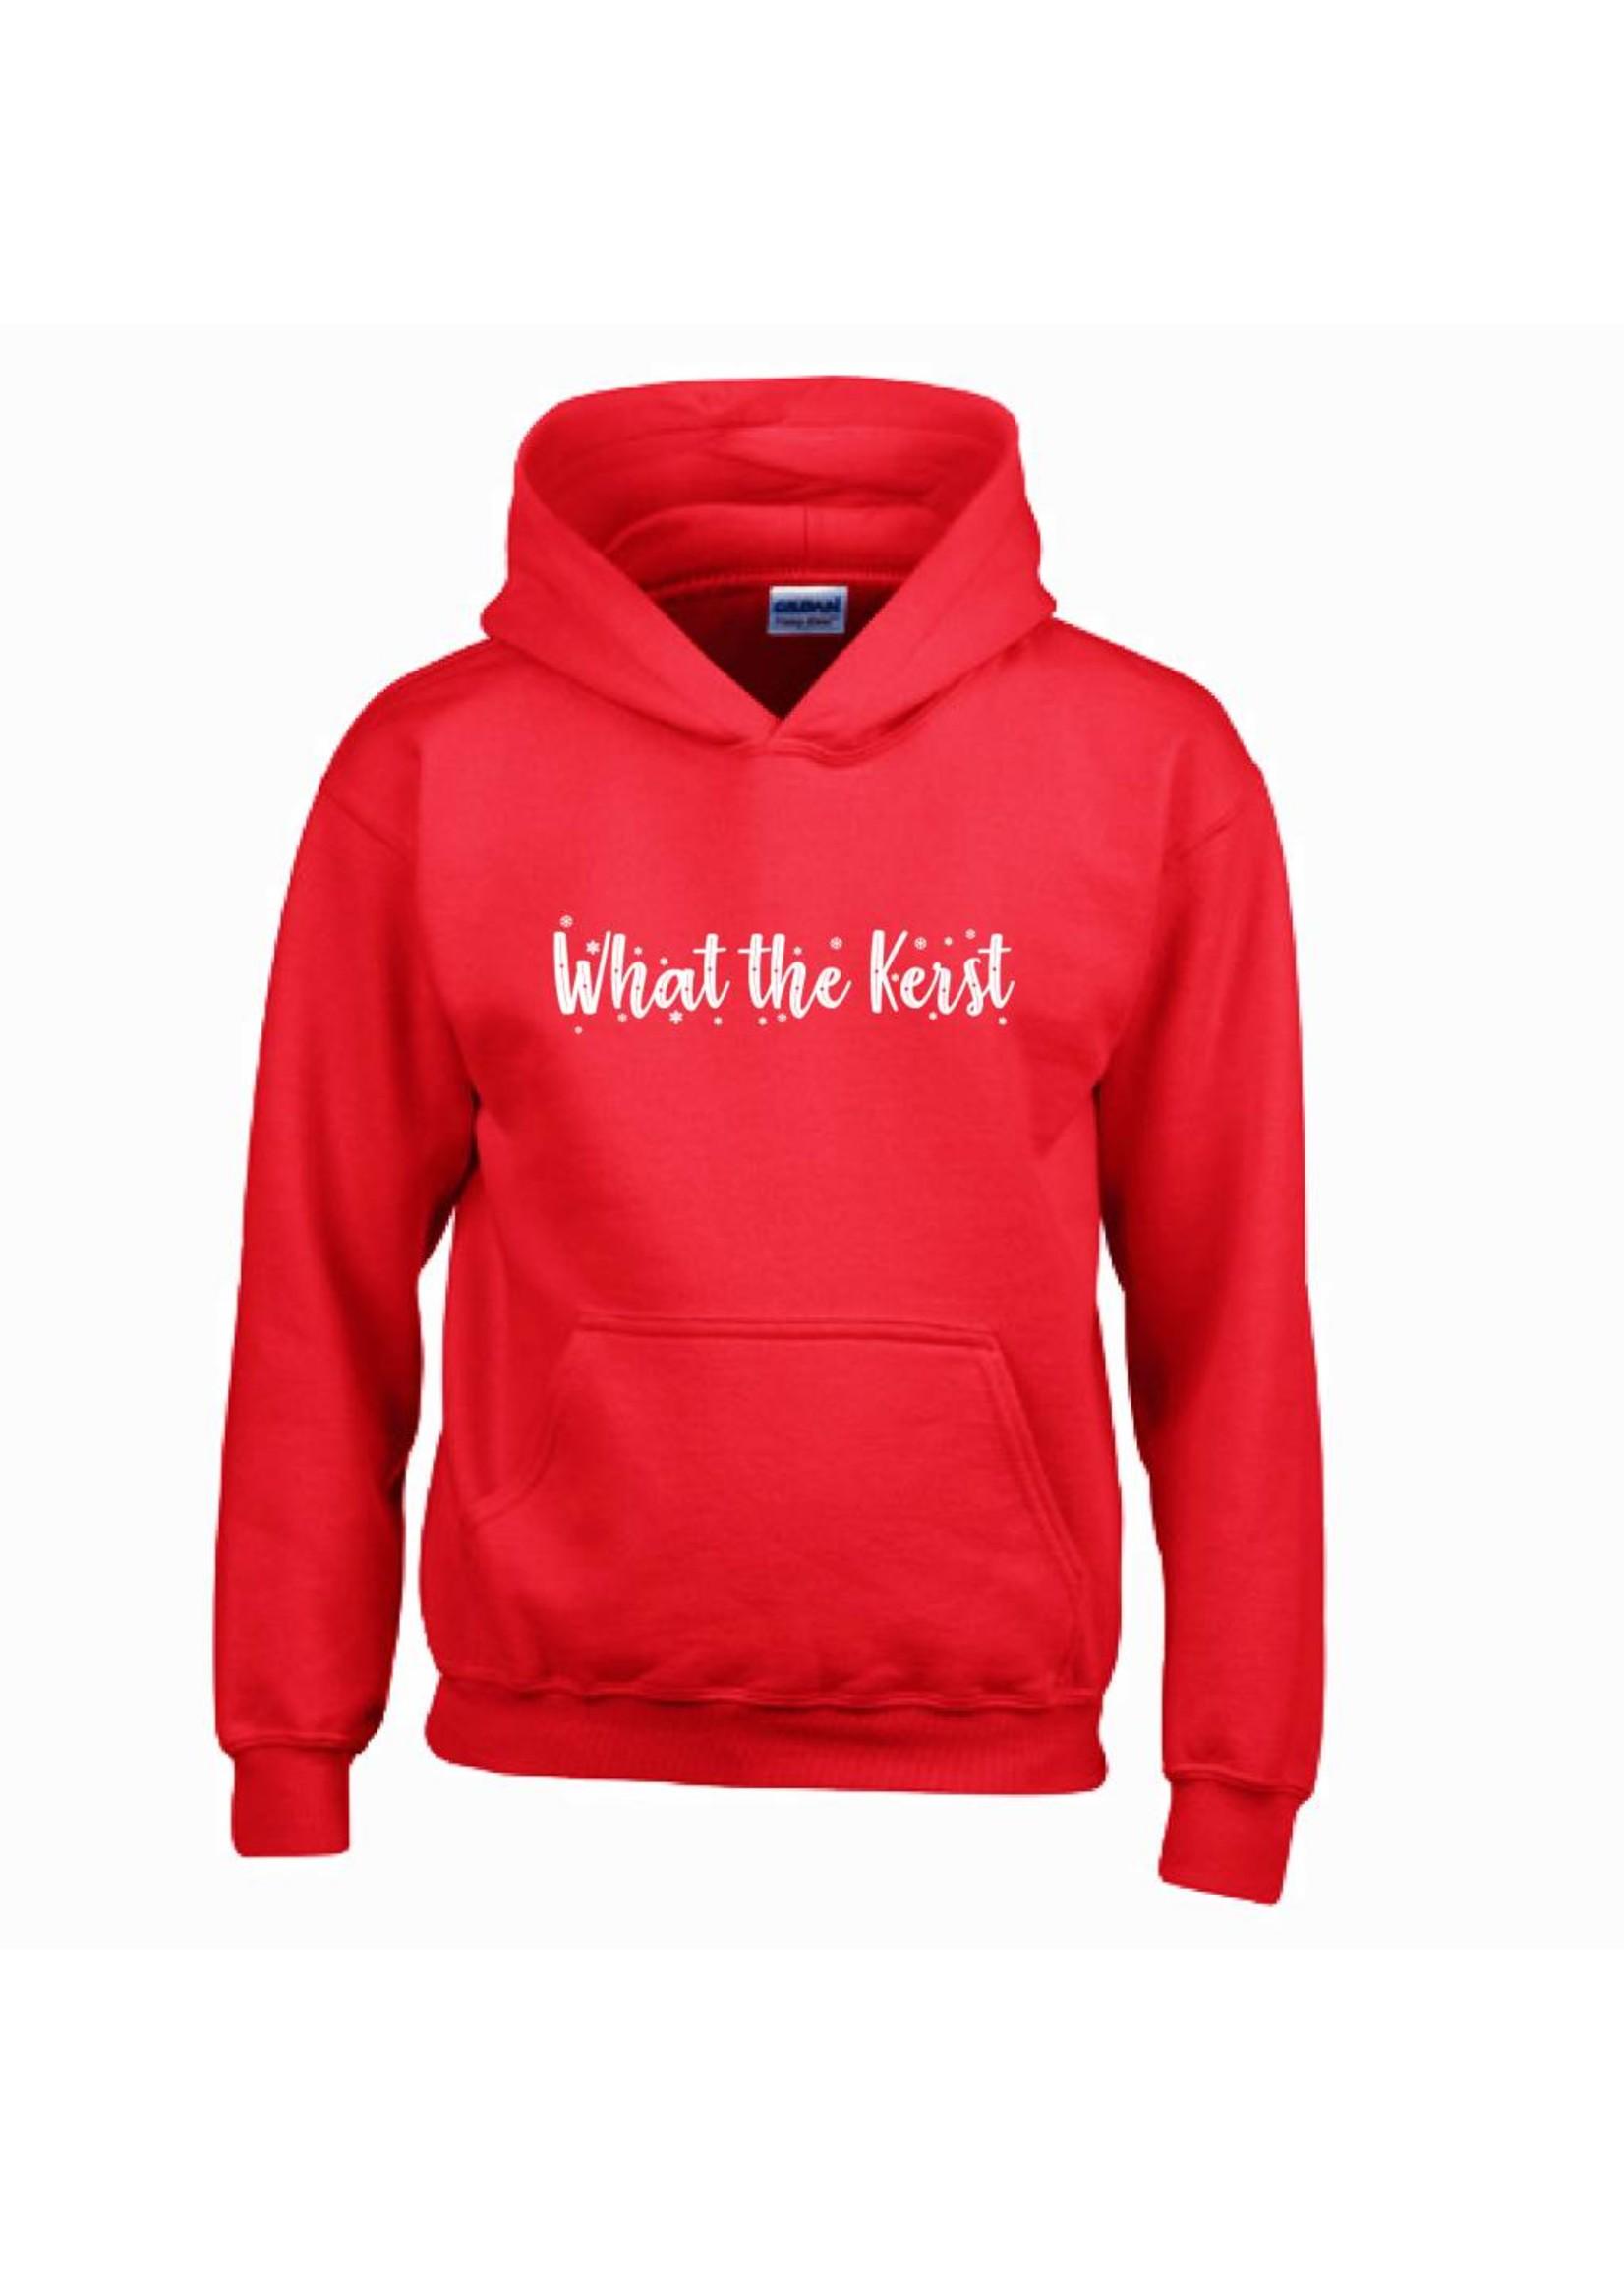 What the Kerst hoodie